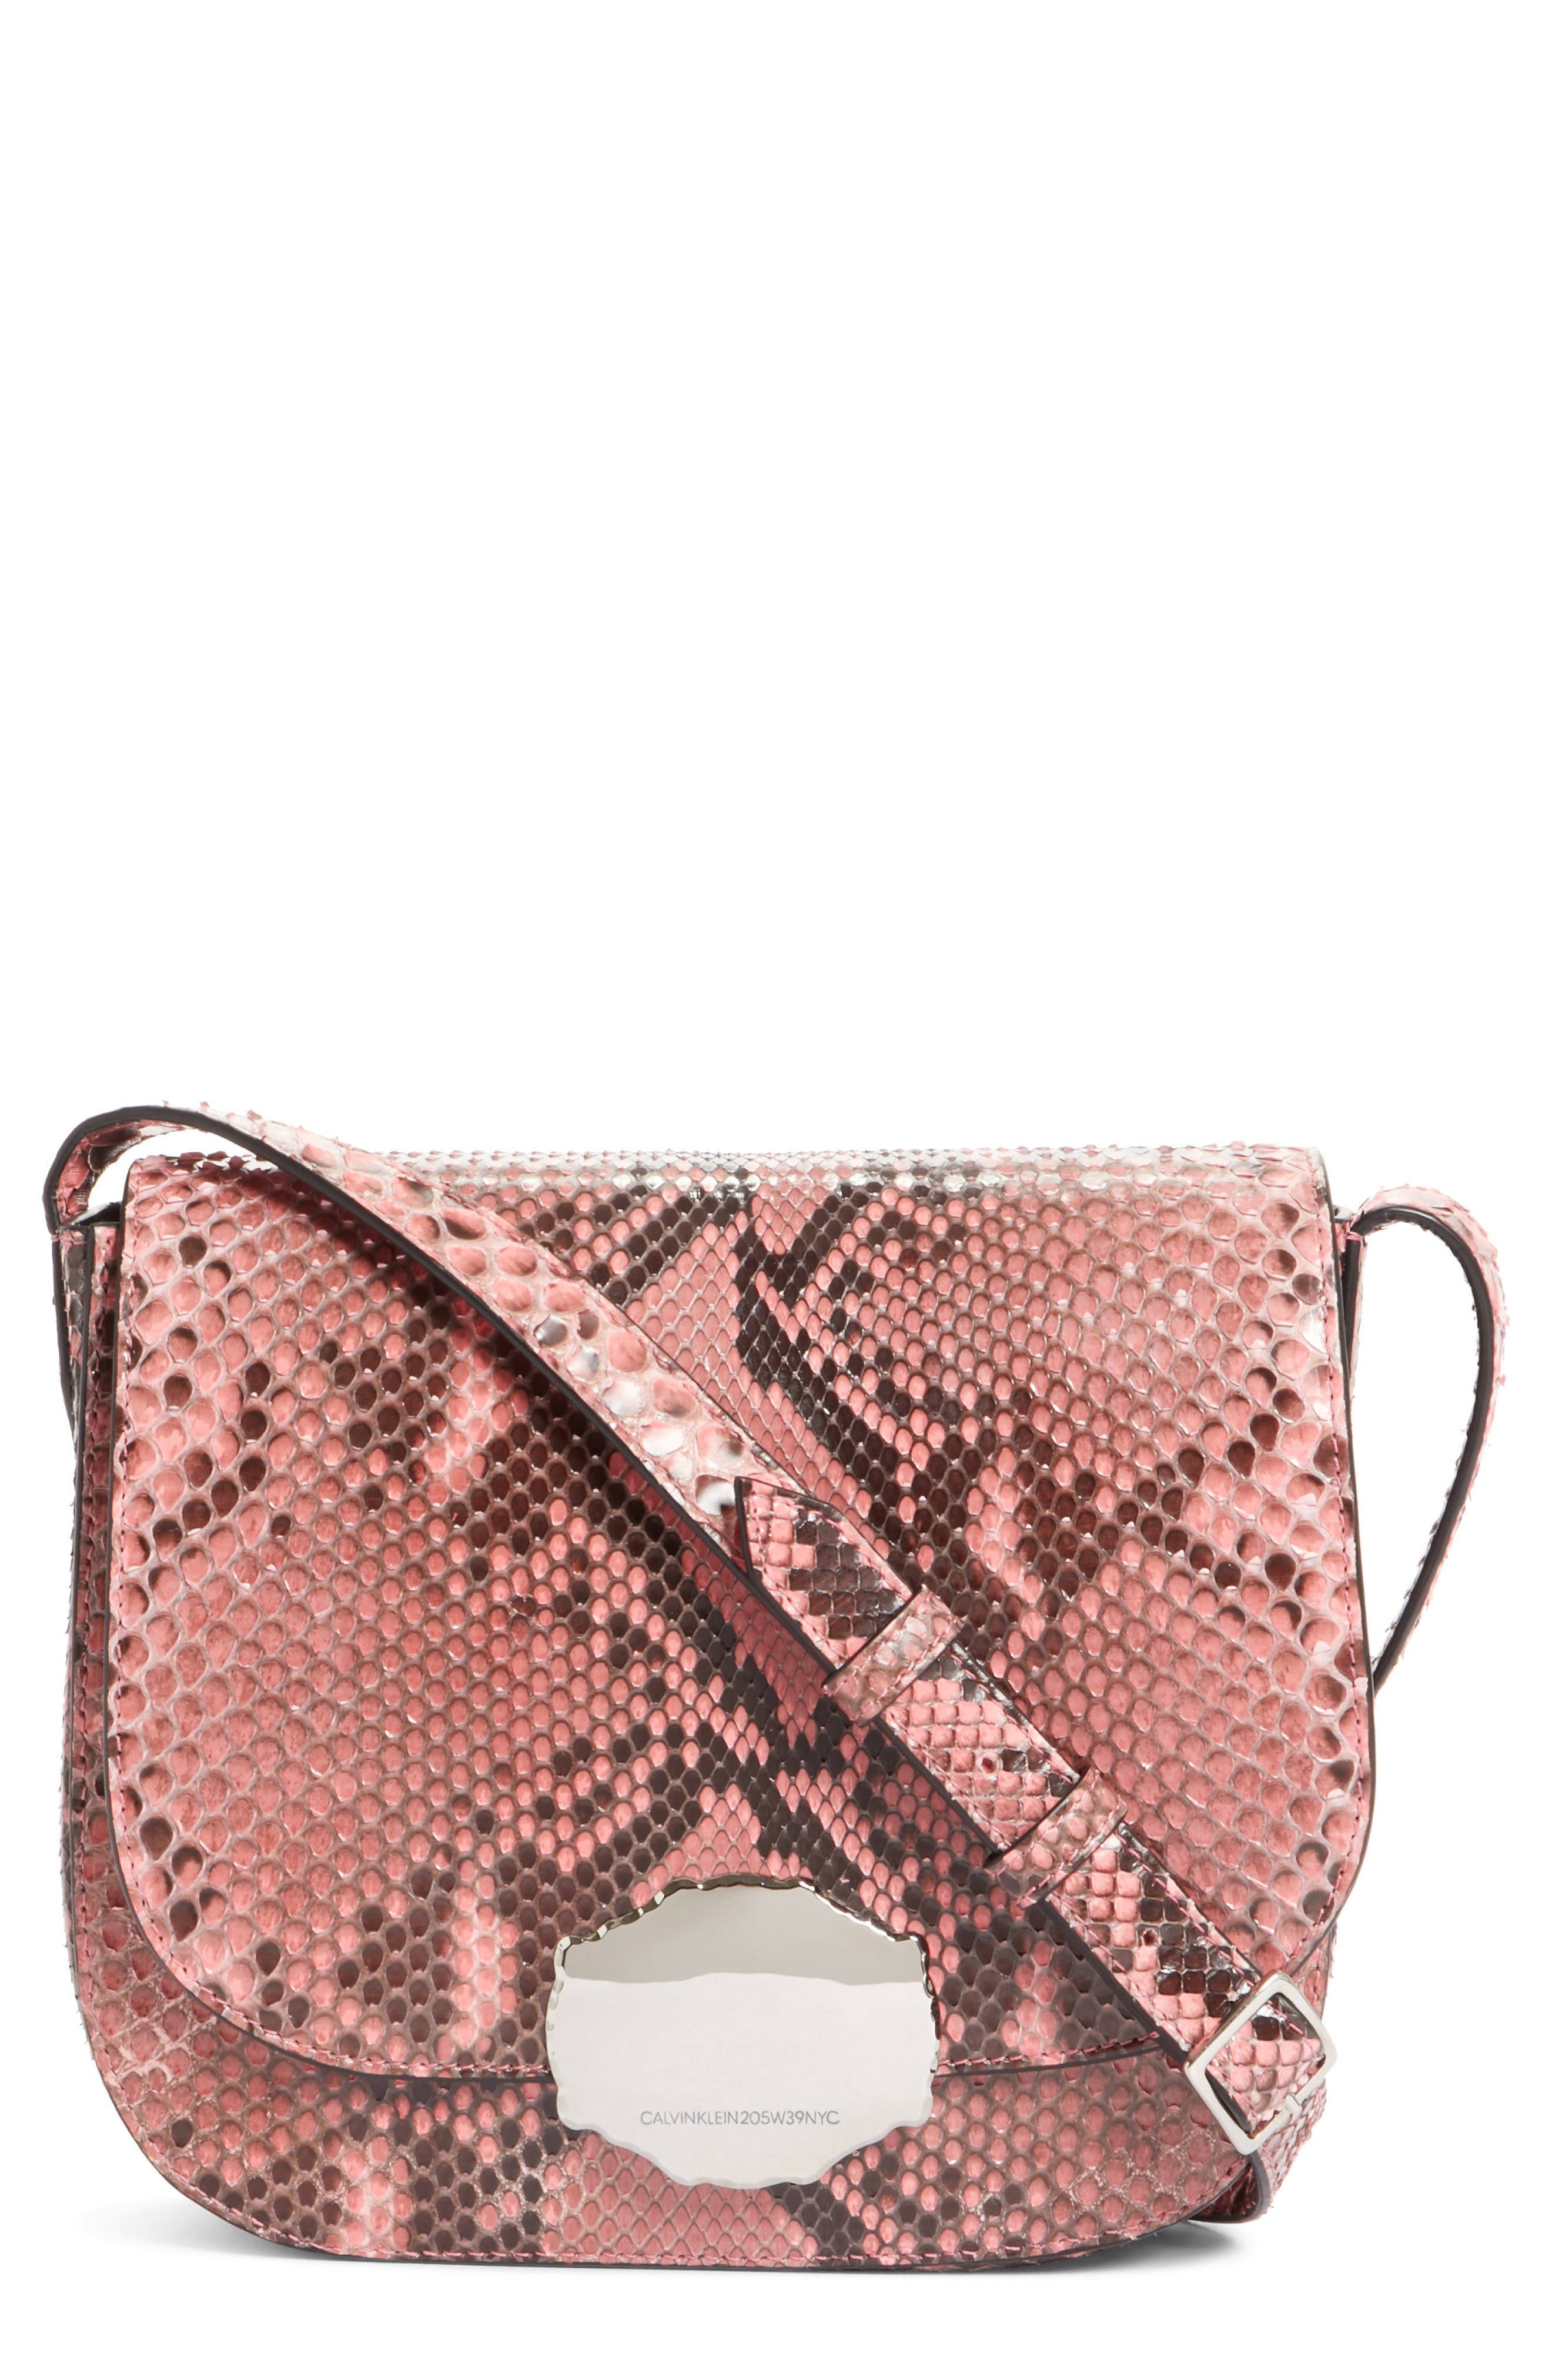 Main Image - Calvin Klein 205W395NYC Genuine Python Shoulder Bag